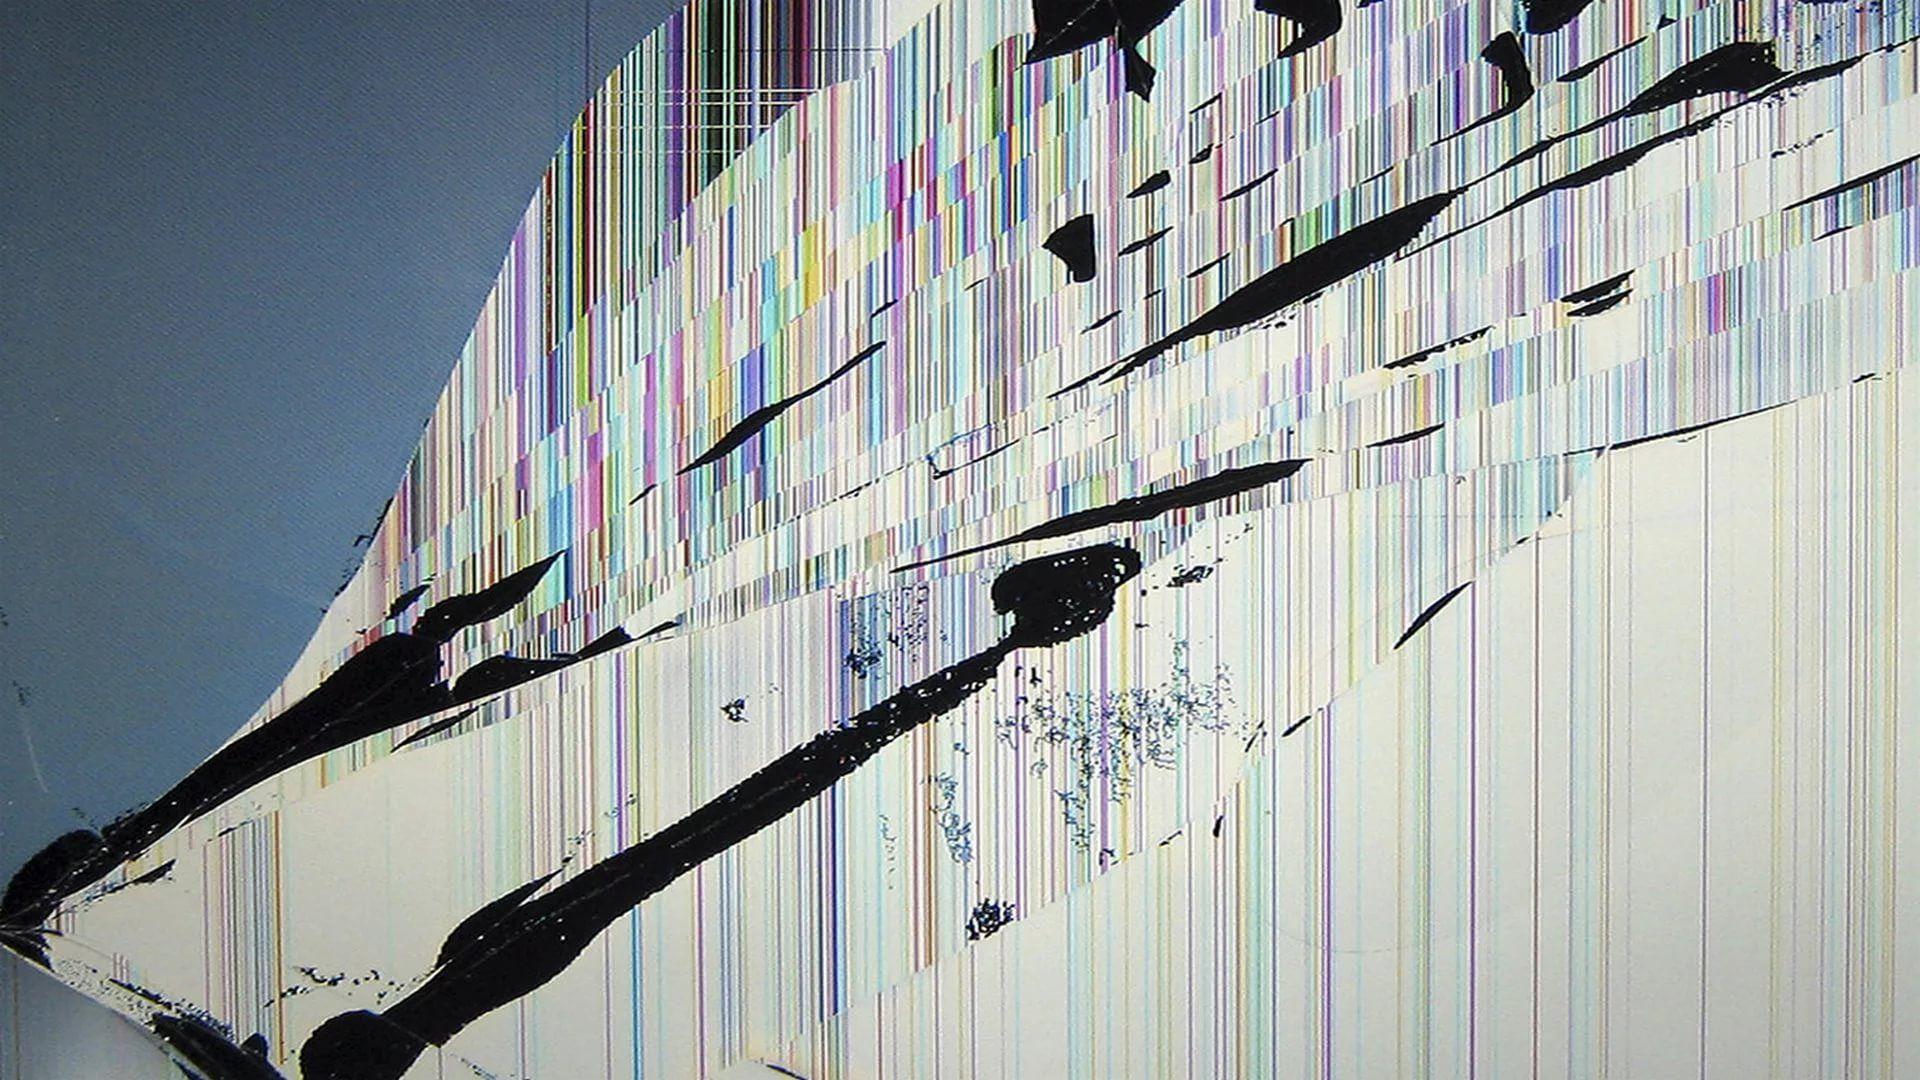 Broken Screen HD Desktop Wallpaper